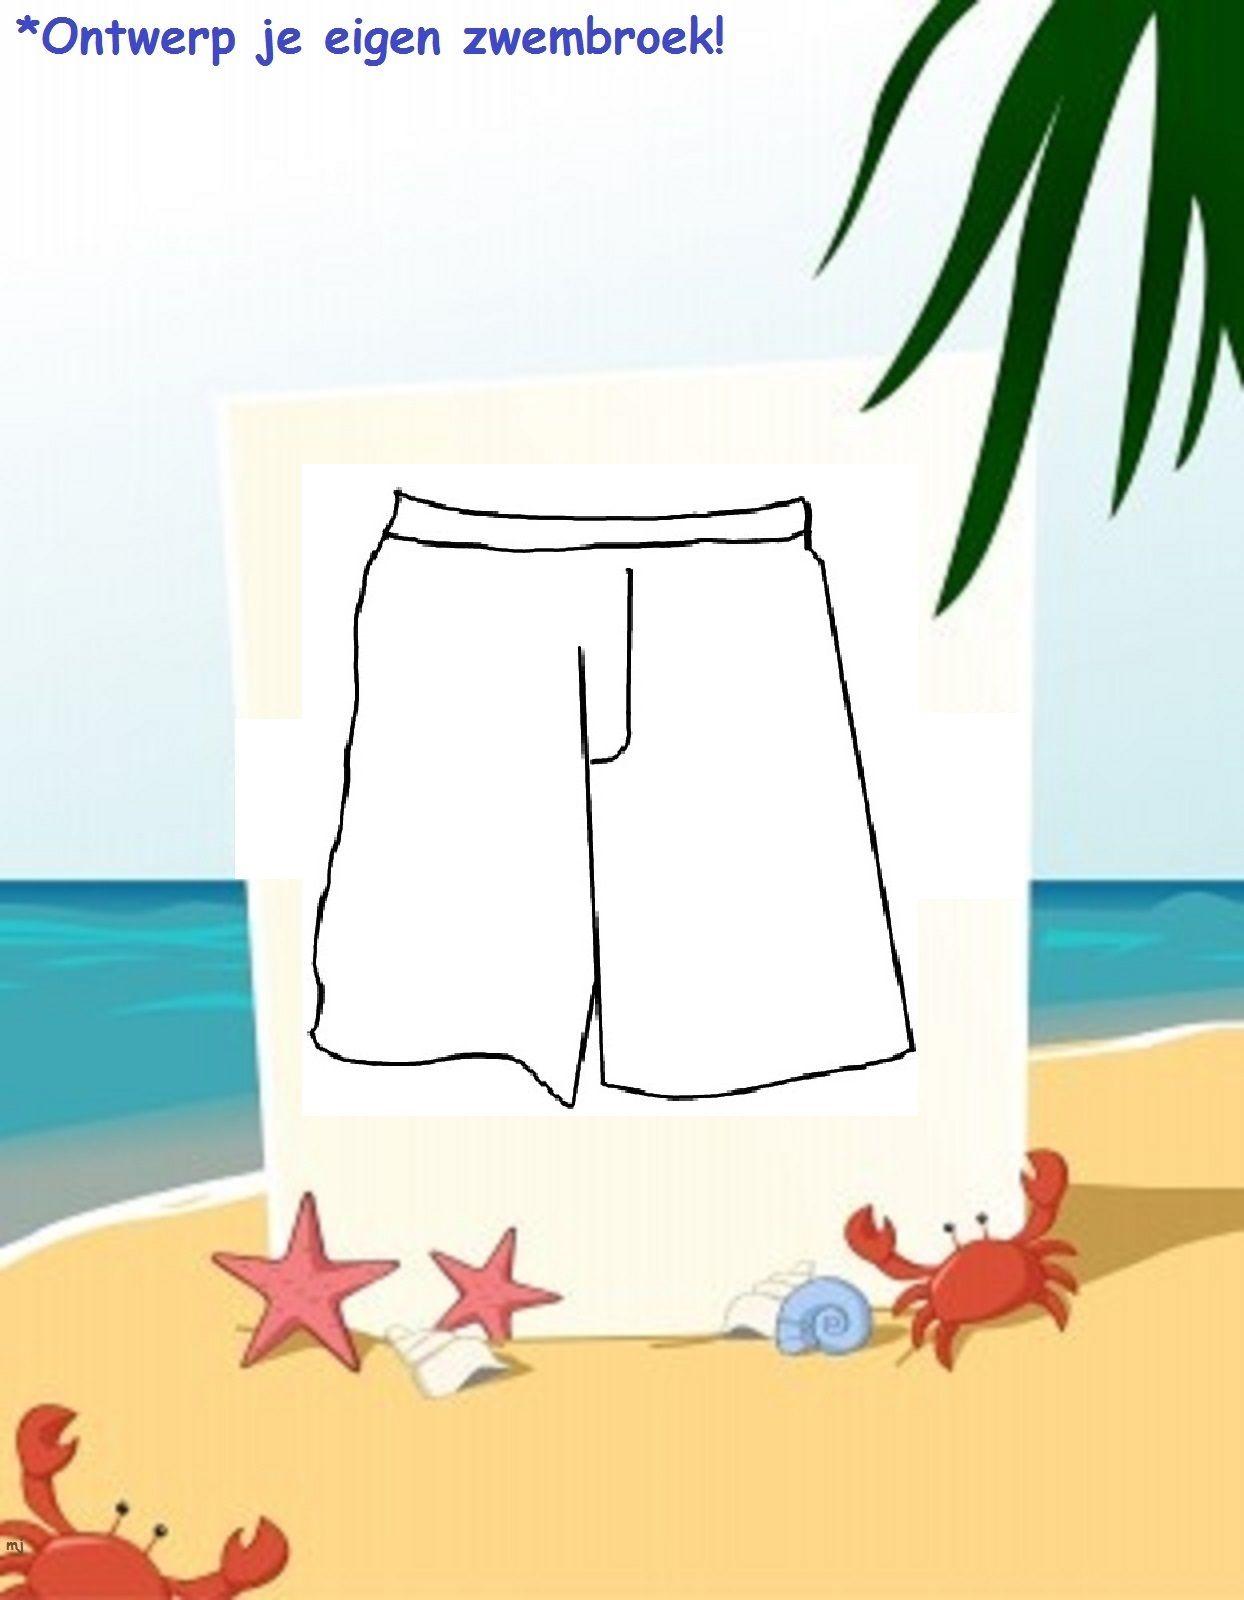 Ontwerp Je Eigen Zwembroek Gebruik Verschillende Materialen Zomer Kleurplaten Thema Strand Thema